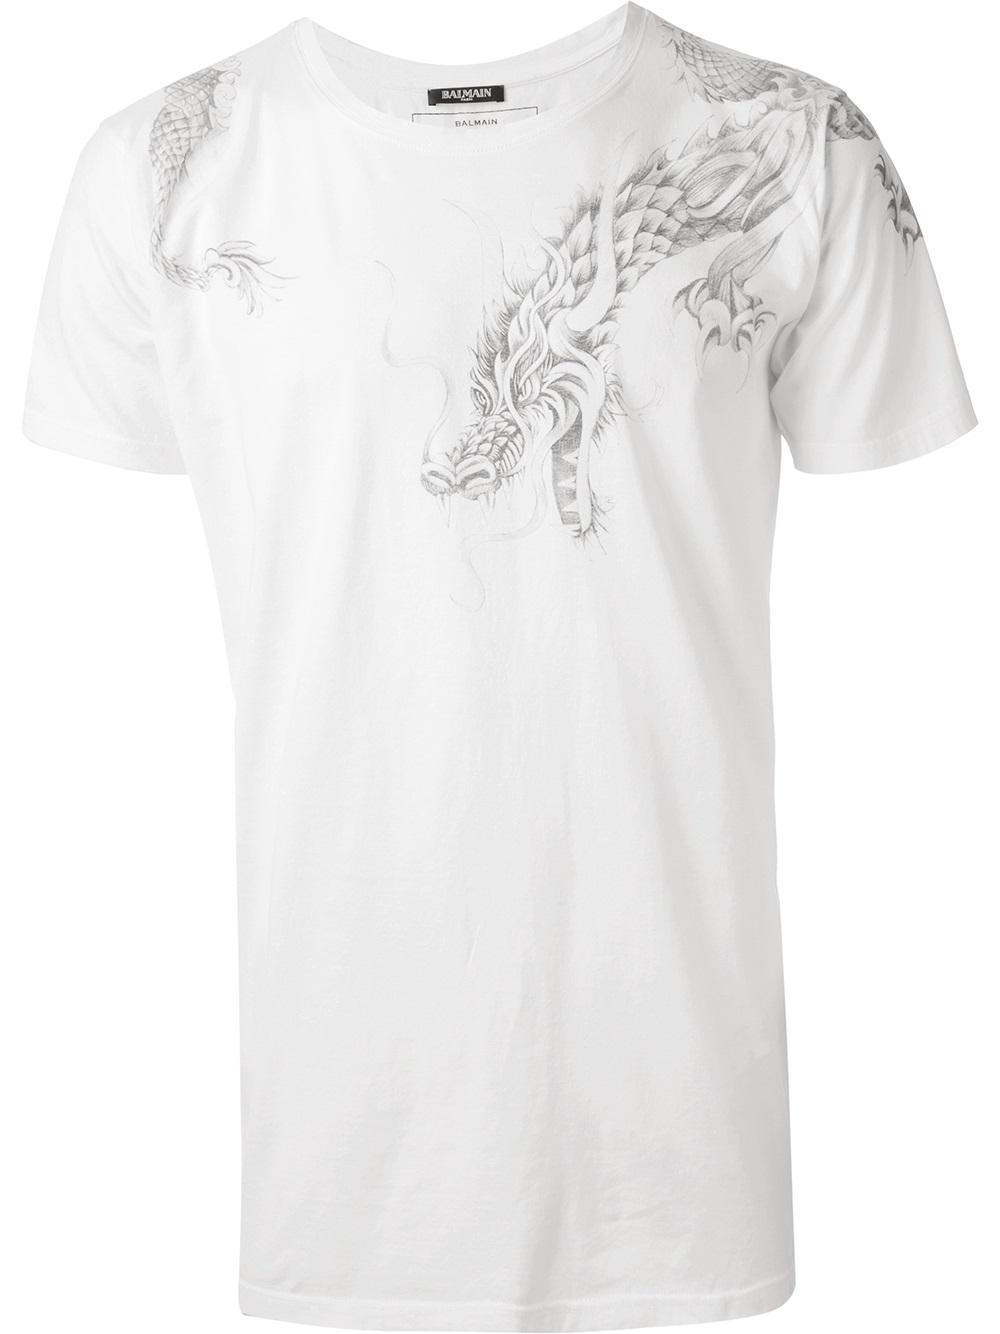 Balmain Dragon Tshirt In White For Men Lyst